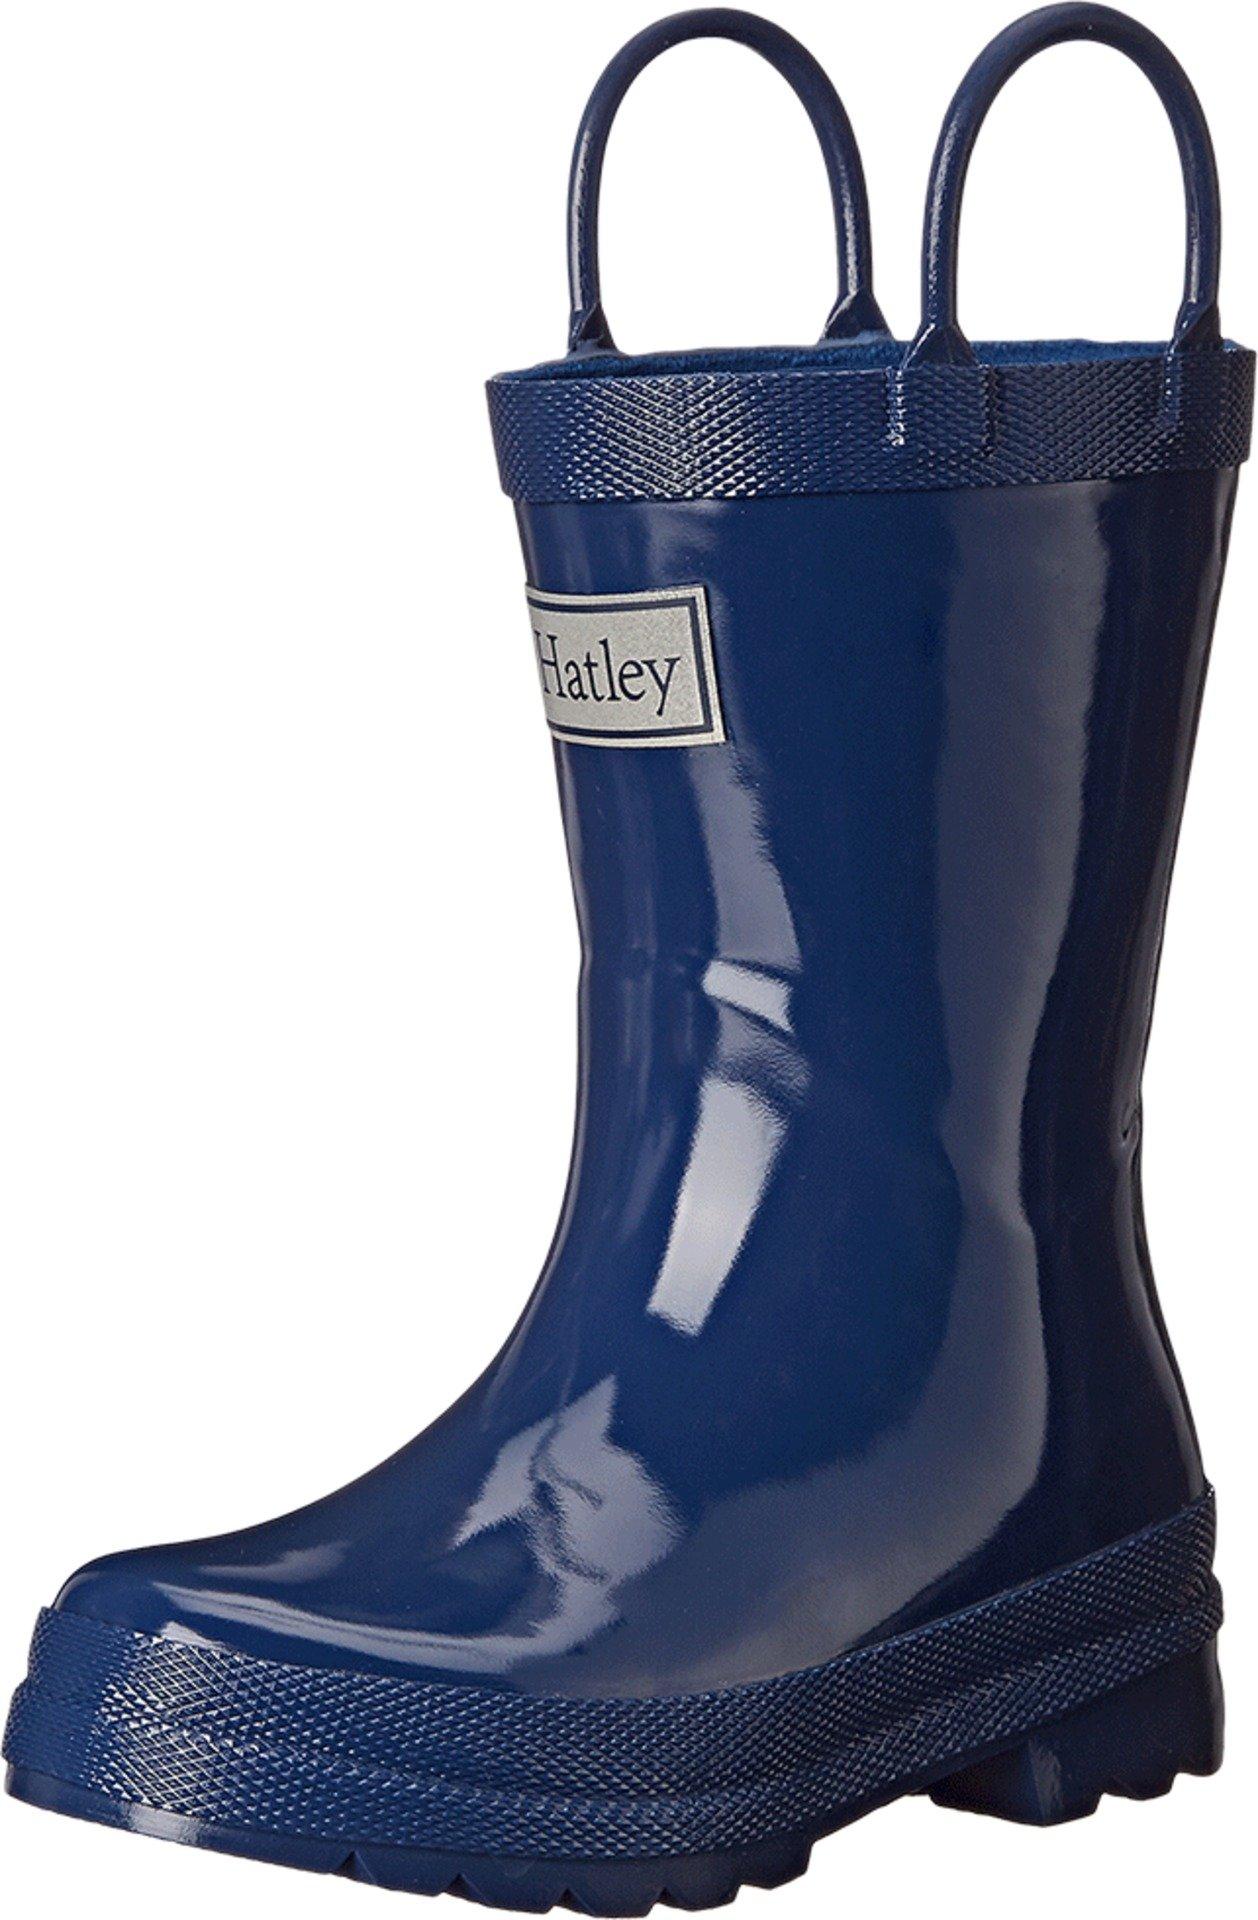 Hatley Kids Boy's Solid Rain Boot (Toddler/Little Kid) Navy Boot 7 Toddler M